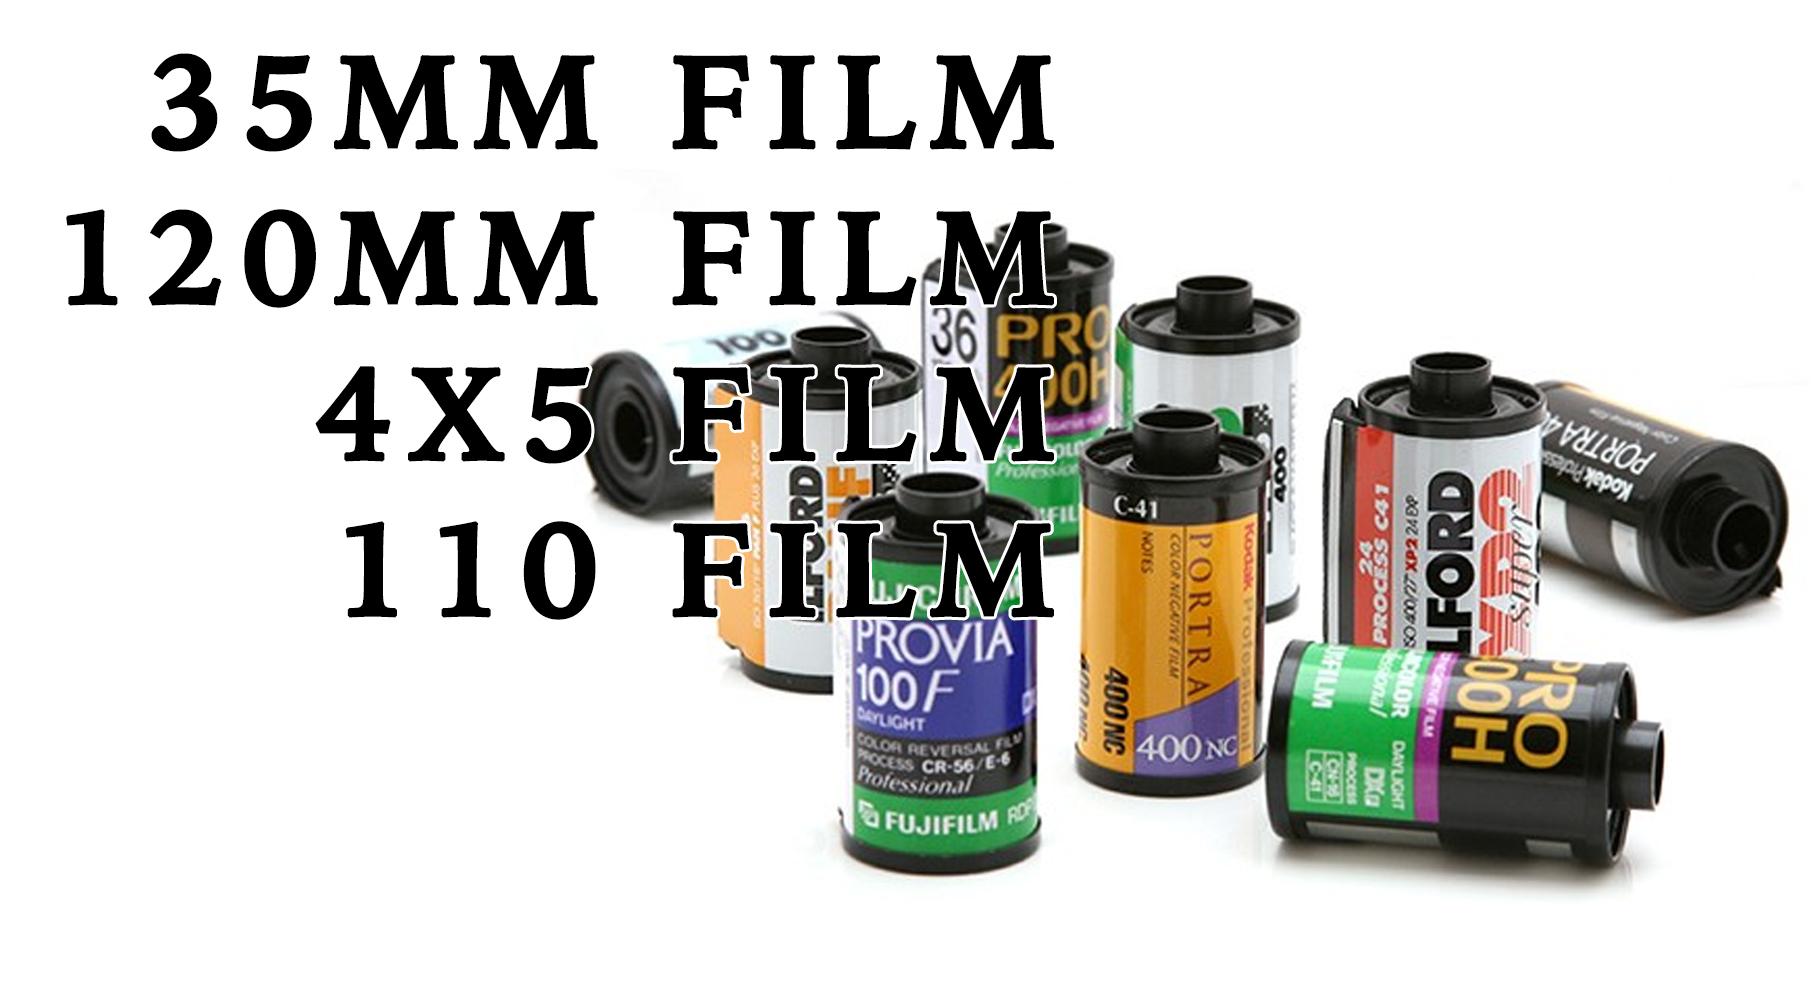 FILM copy.jpg